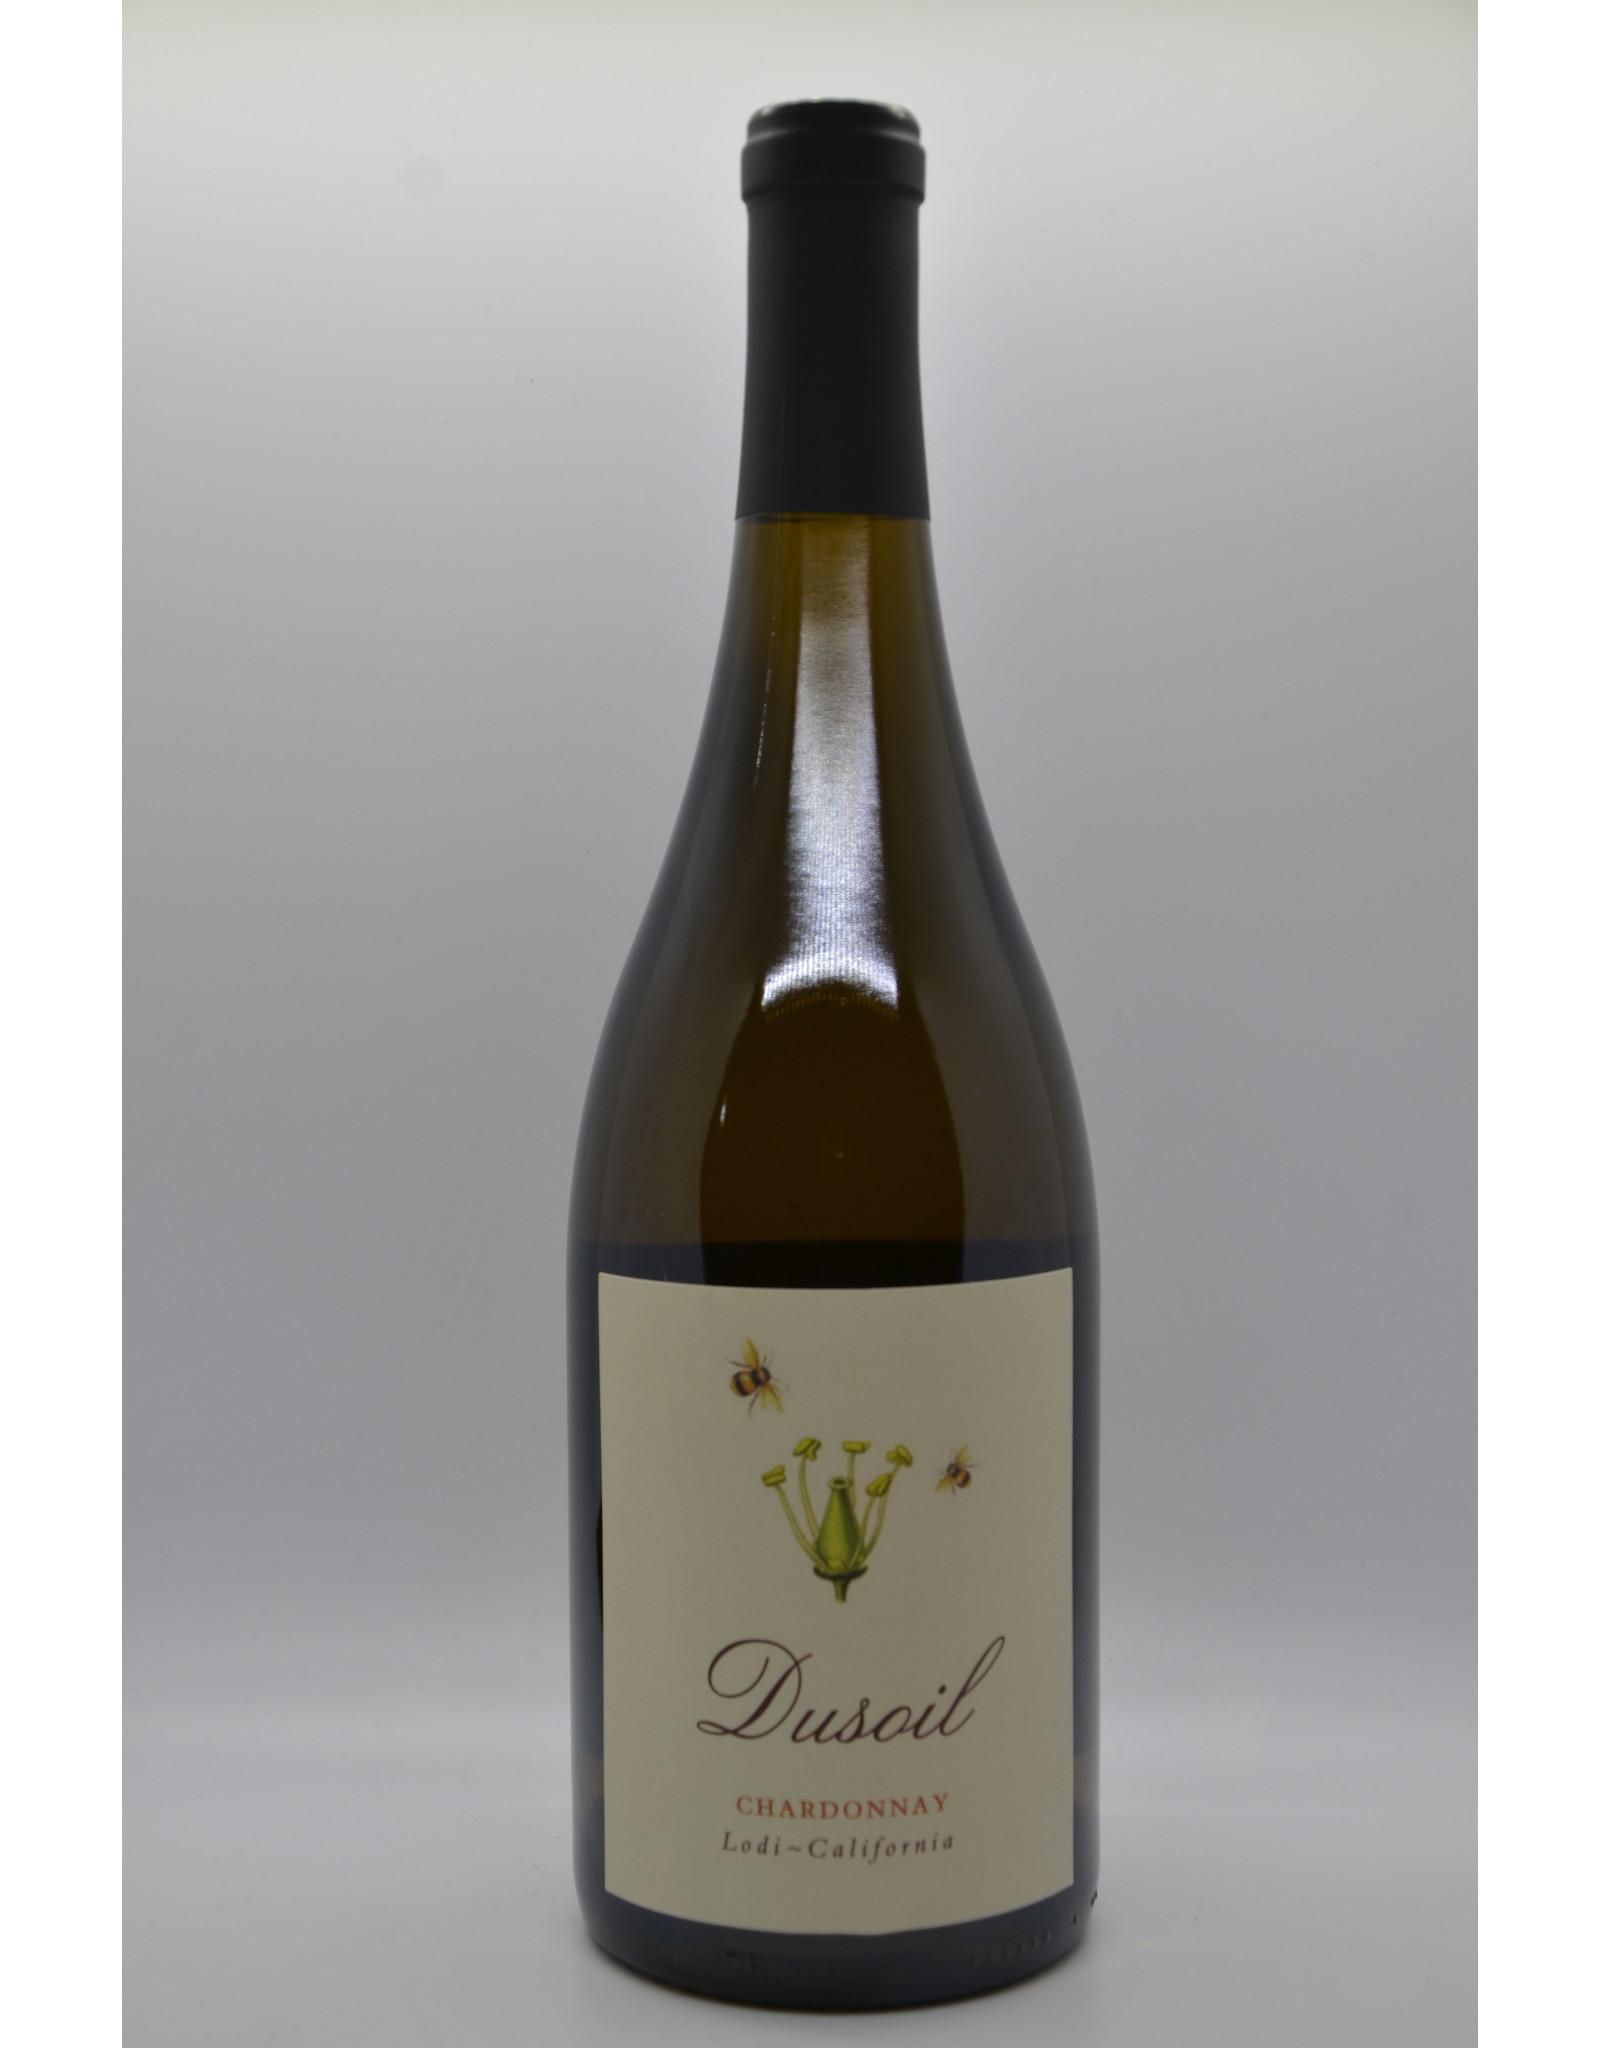 USA Dusoil Chardonnay